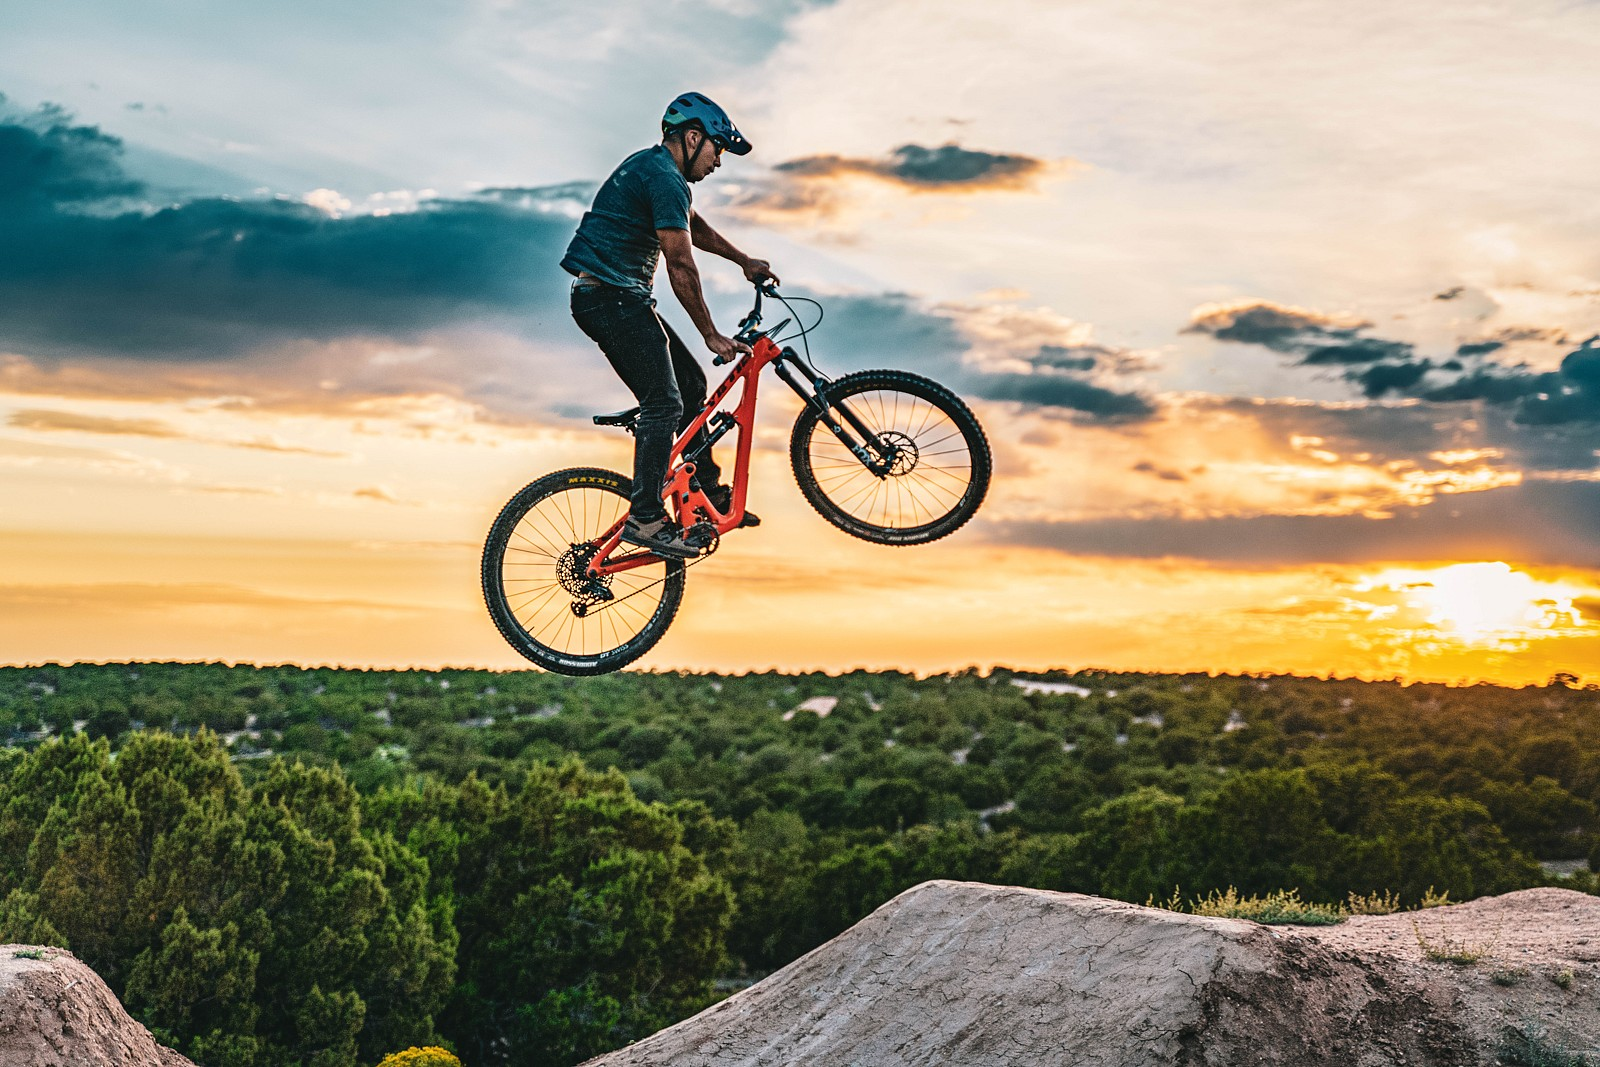 James sunset send - legpwr - Mountain Biking Pictures - Vital MTB